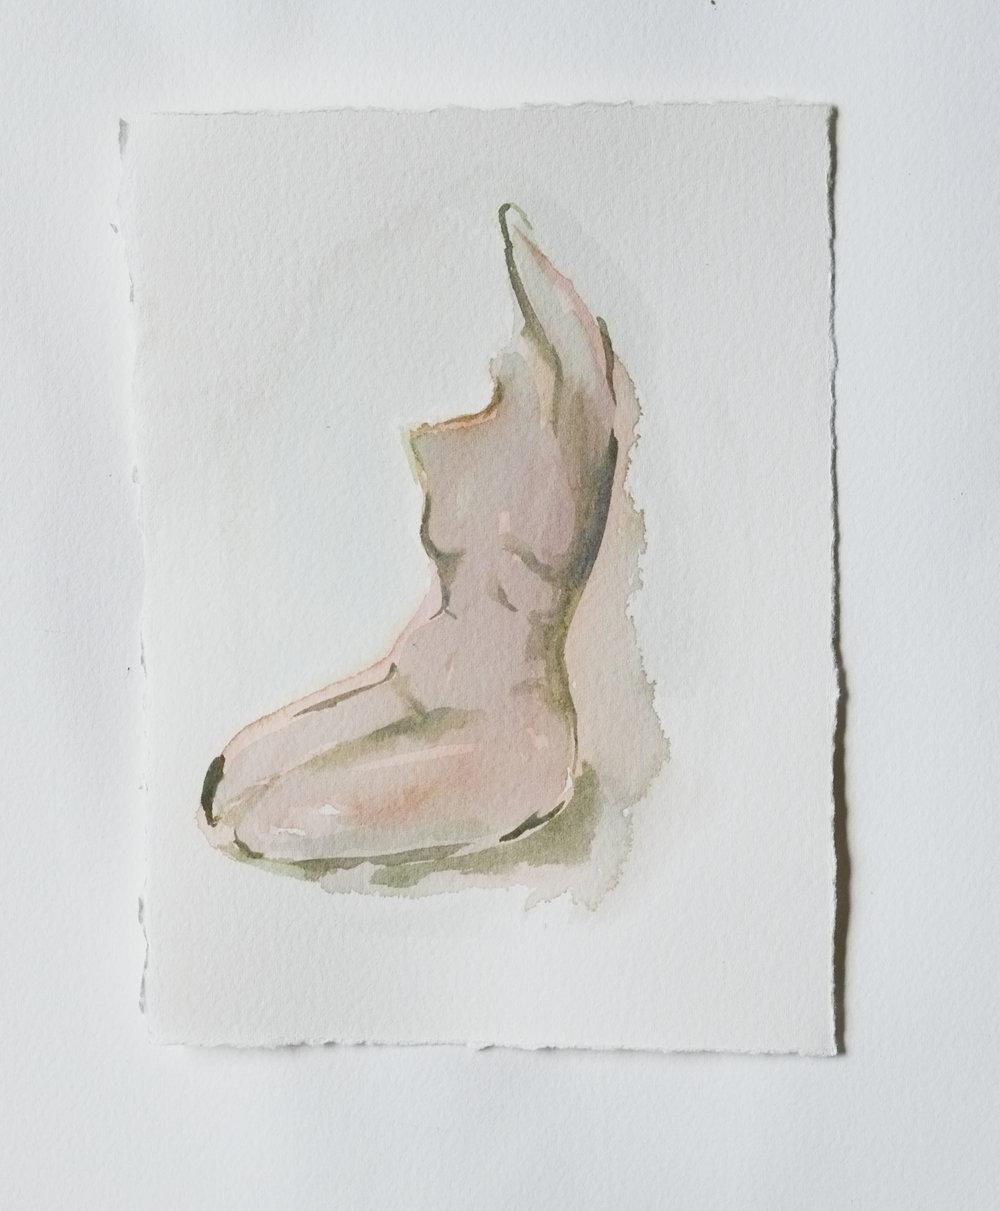 painting_april2017_0027_325.JPG